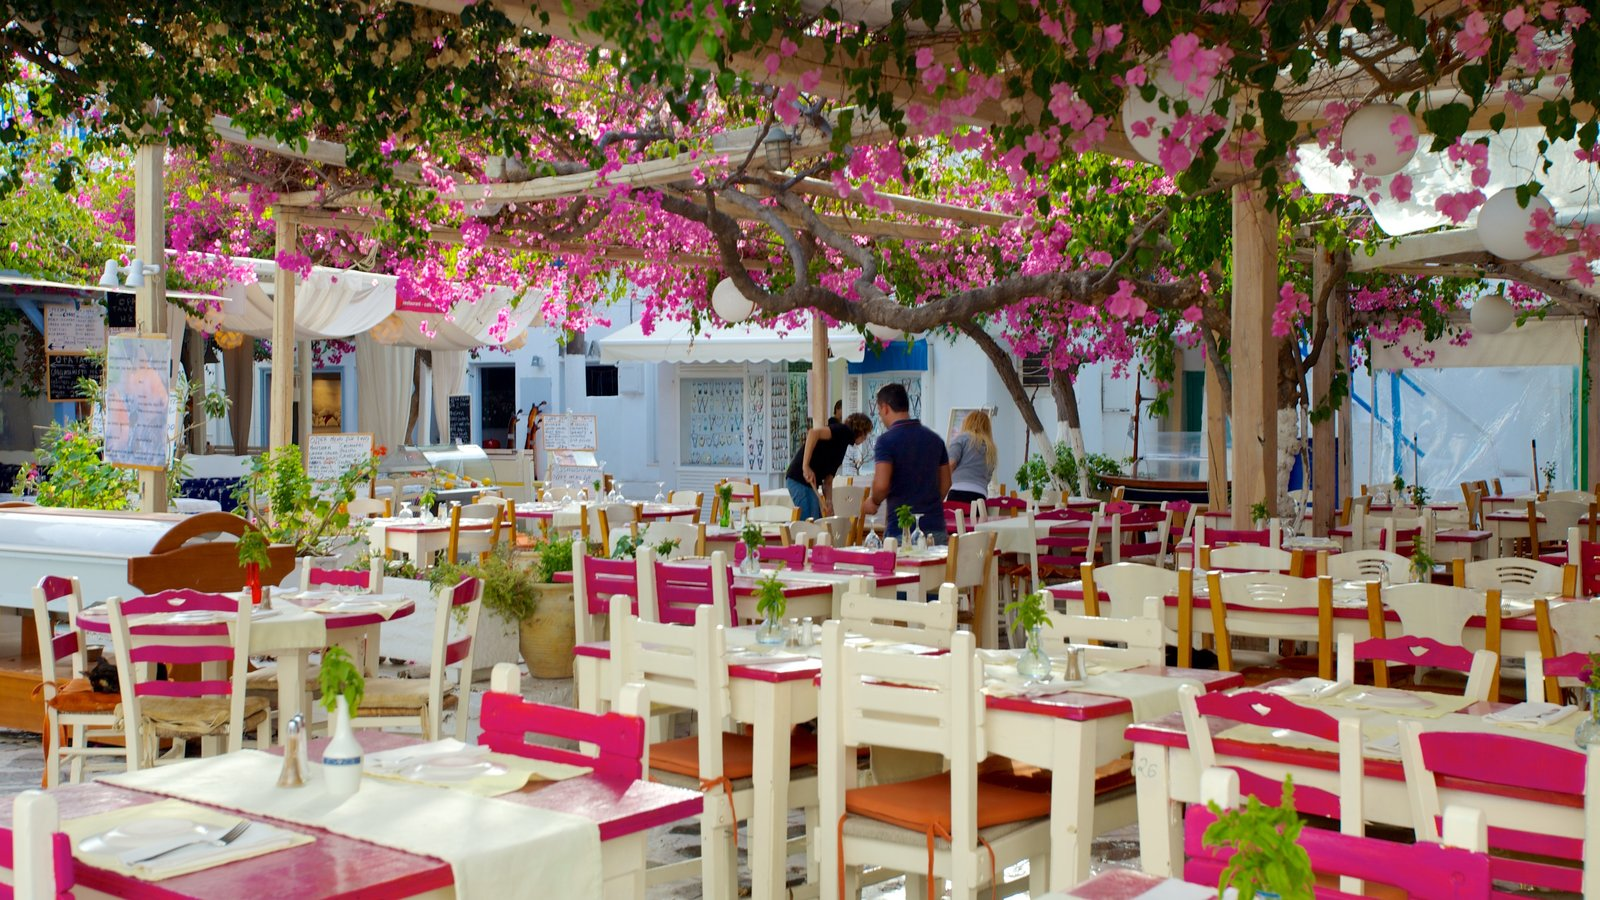 Mykonos Town caracterizando jantar ao ar livre